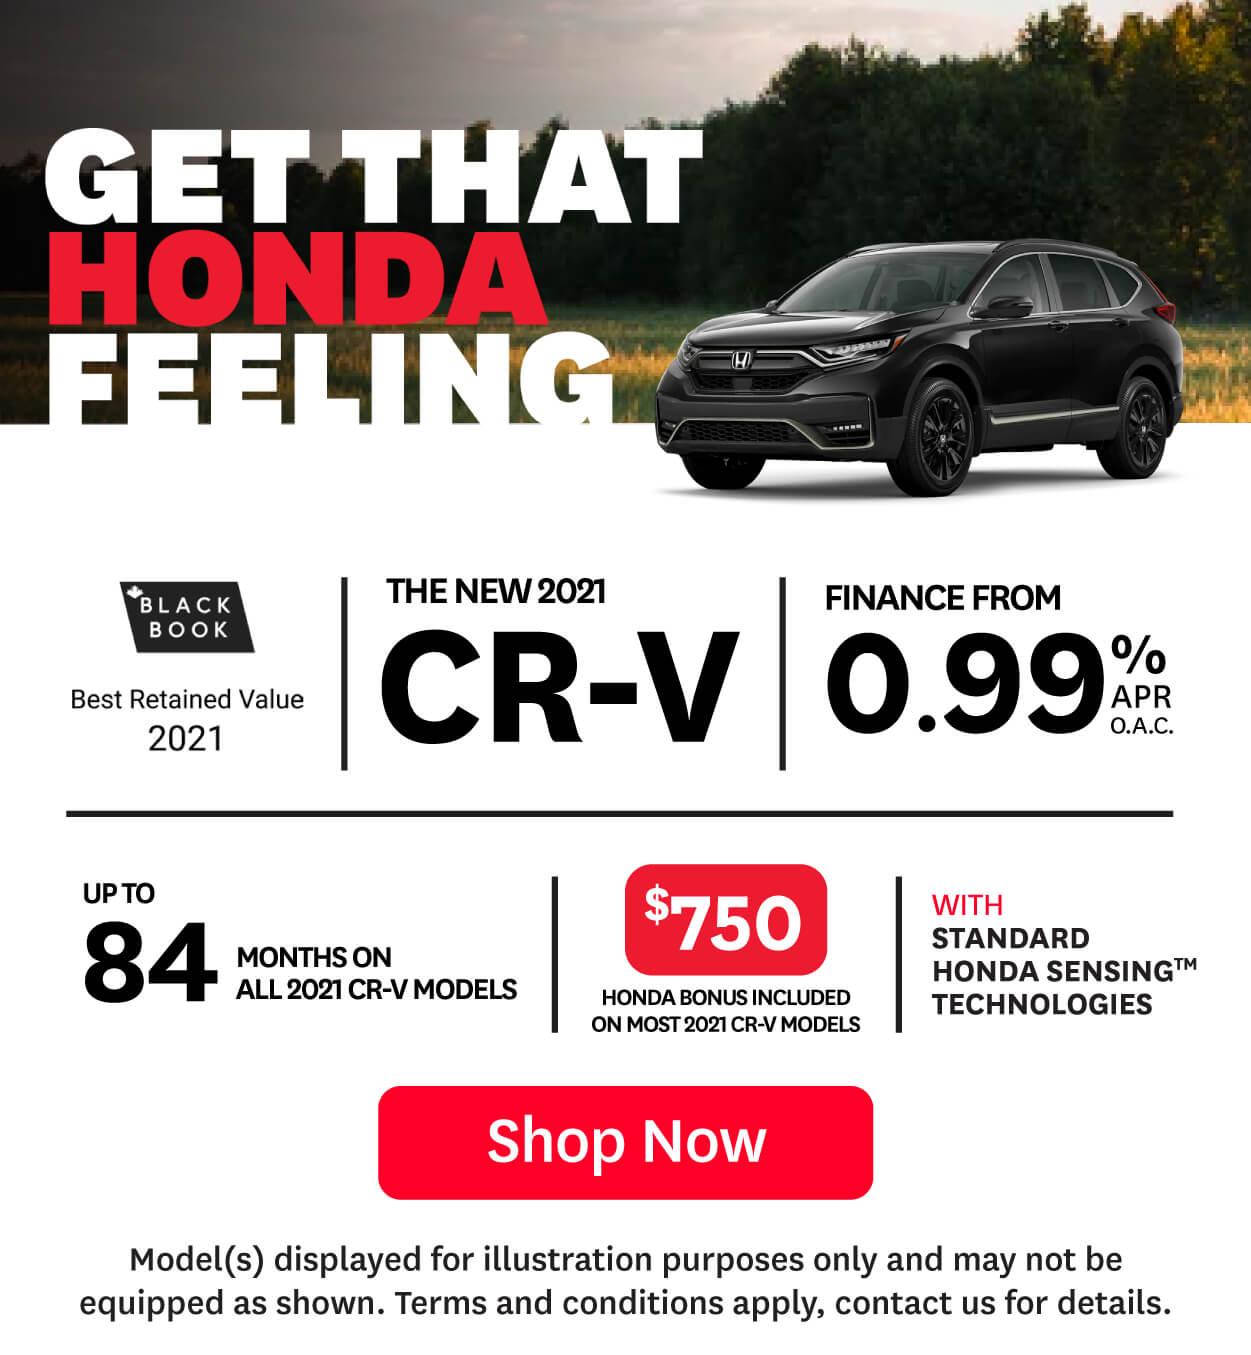 2021 Honda CR-V offer at Goderich Honda